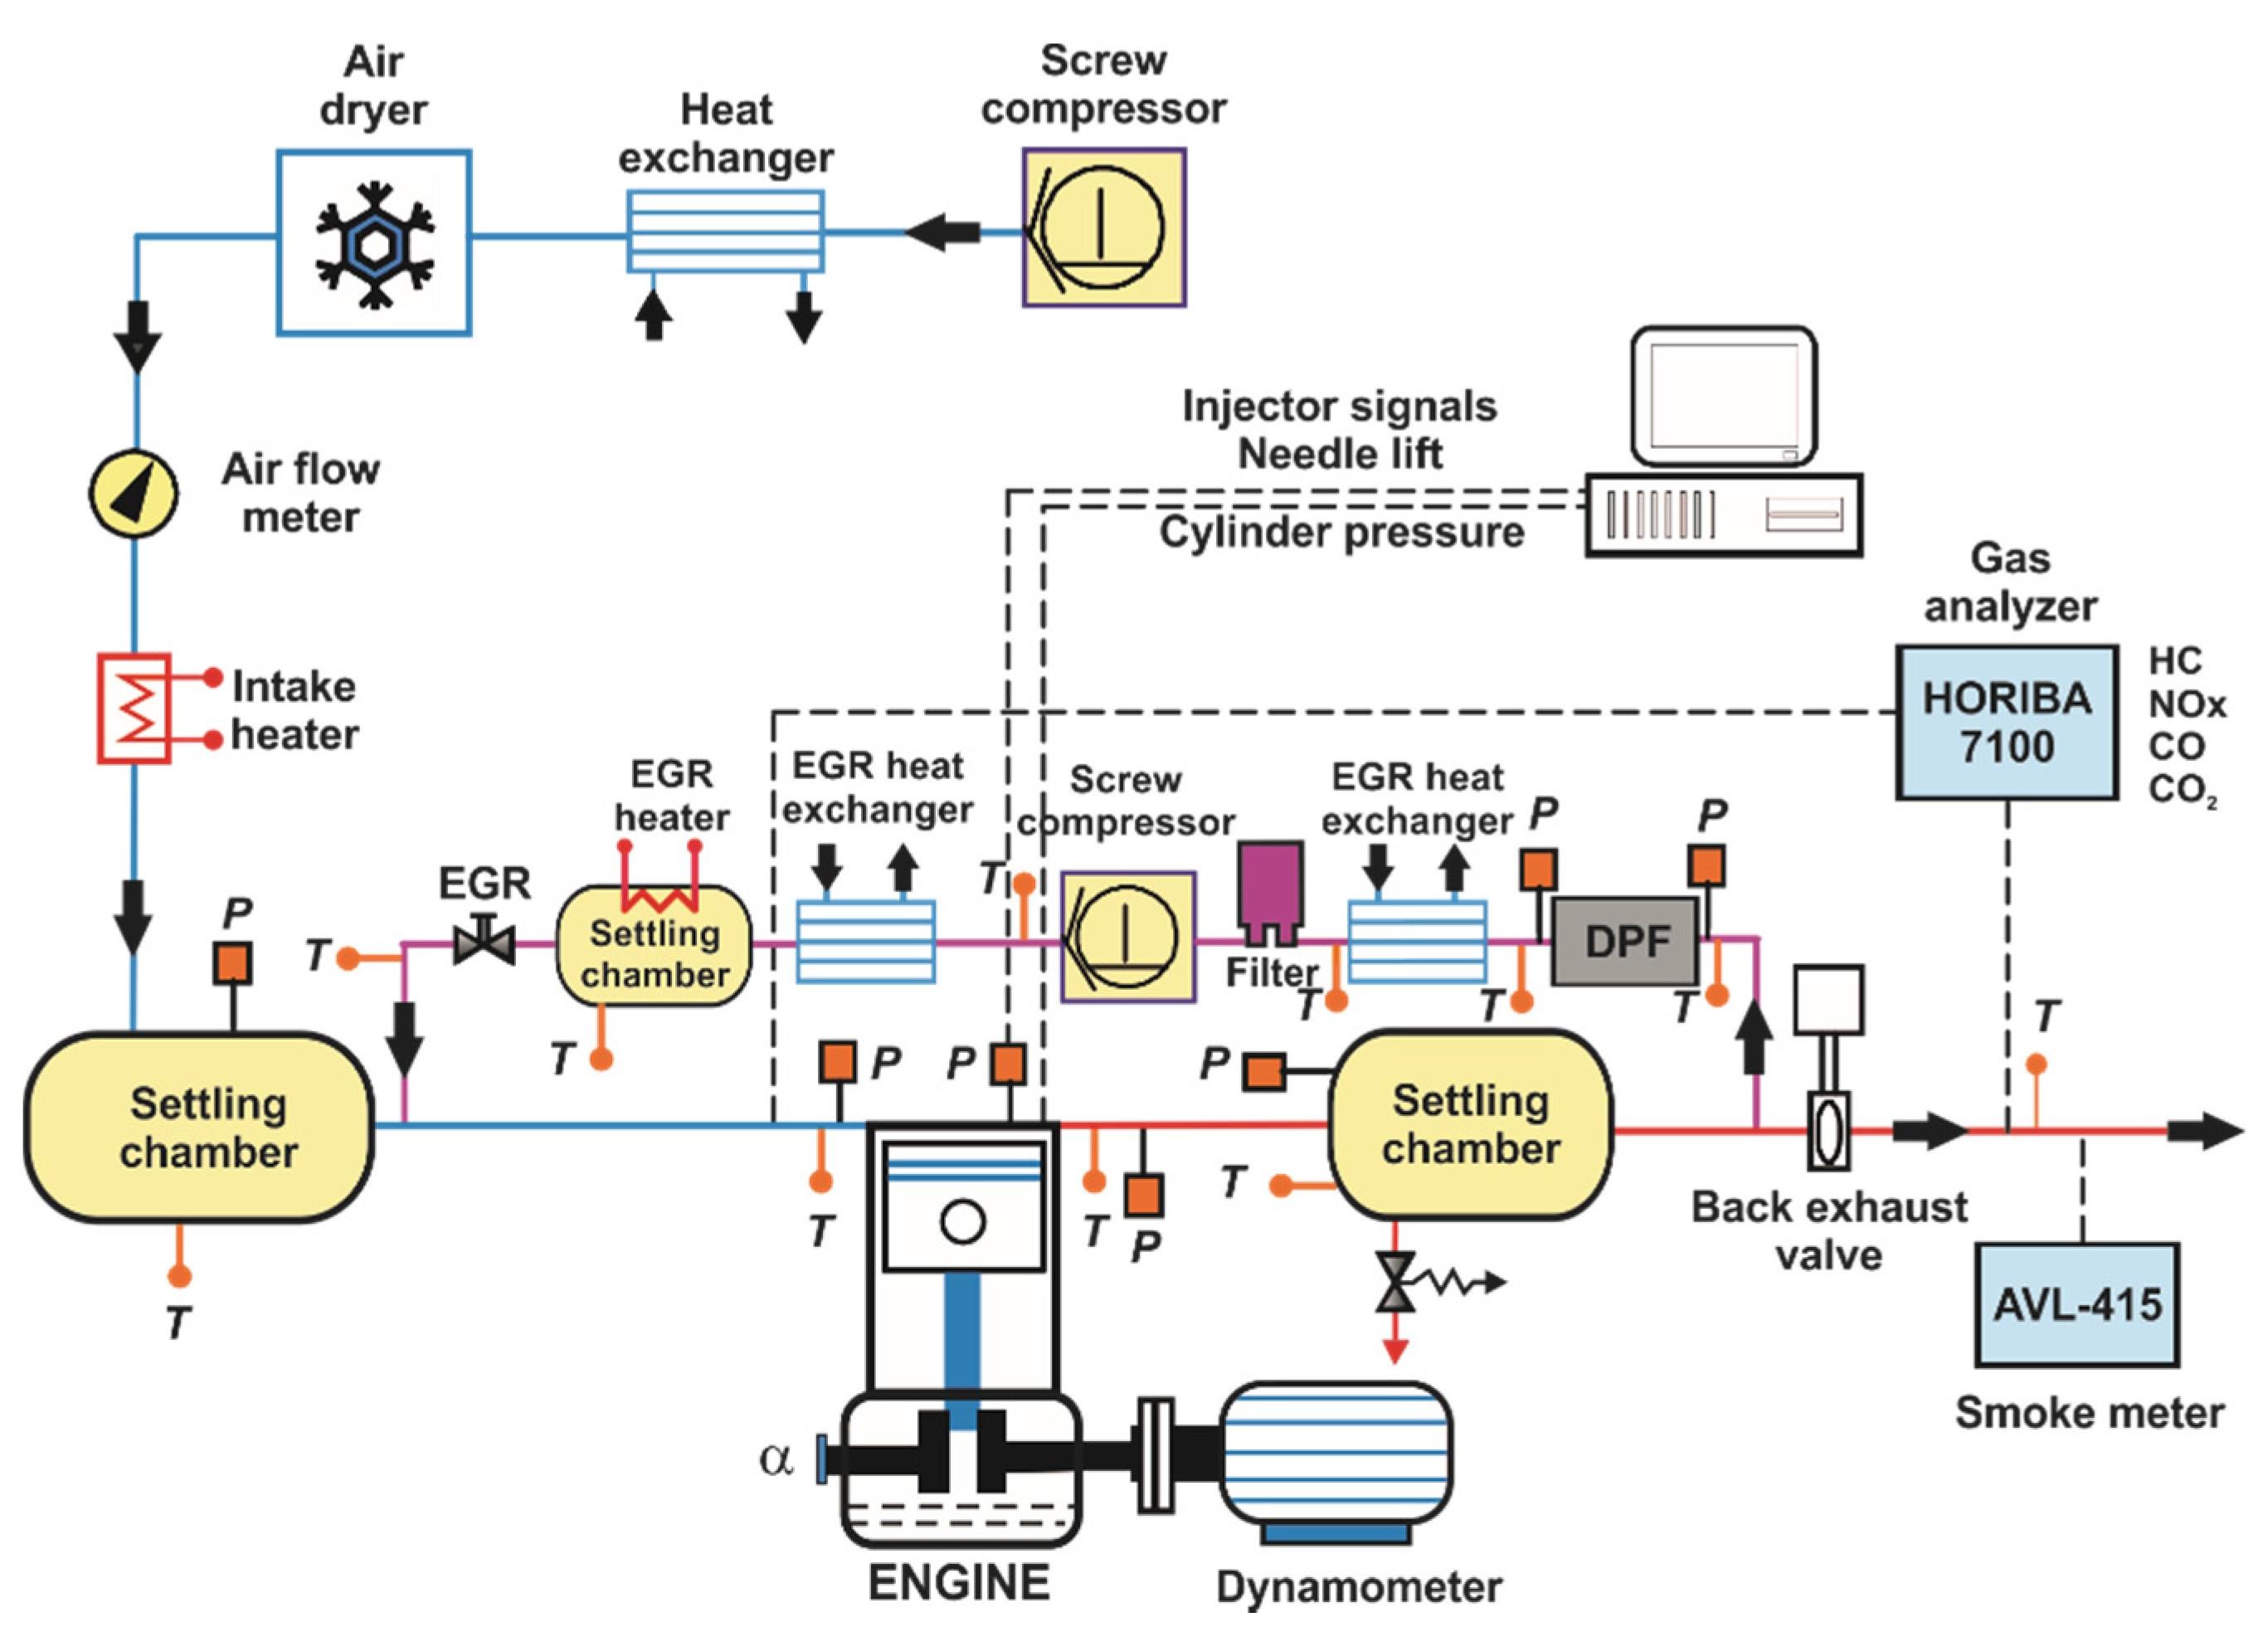 Gasoline Engine Diagram Applied Sciences Free Full Text Of Gasoline Engine Diagram